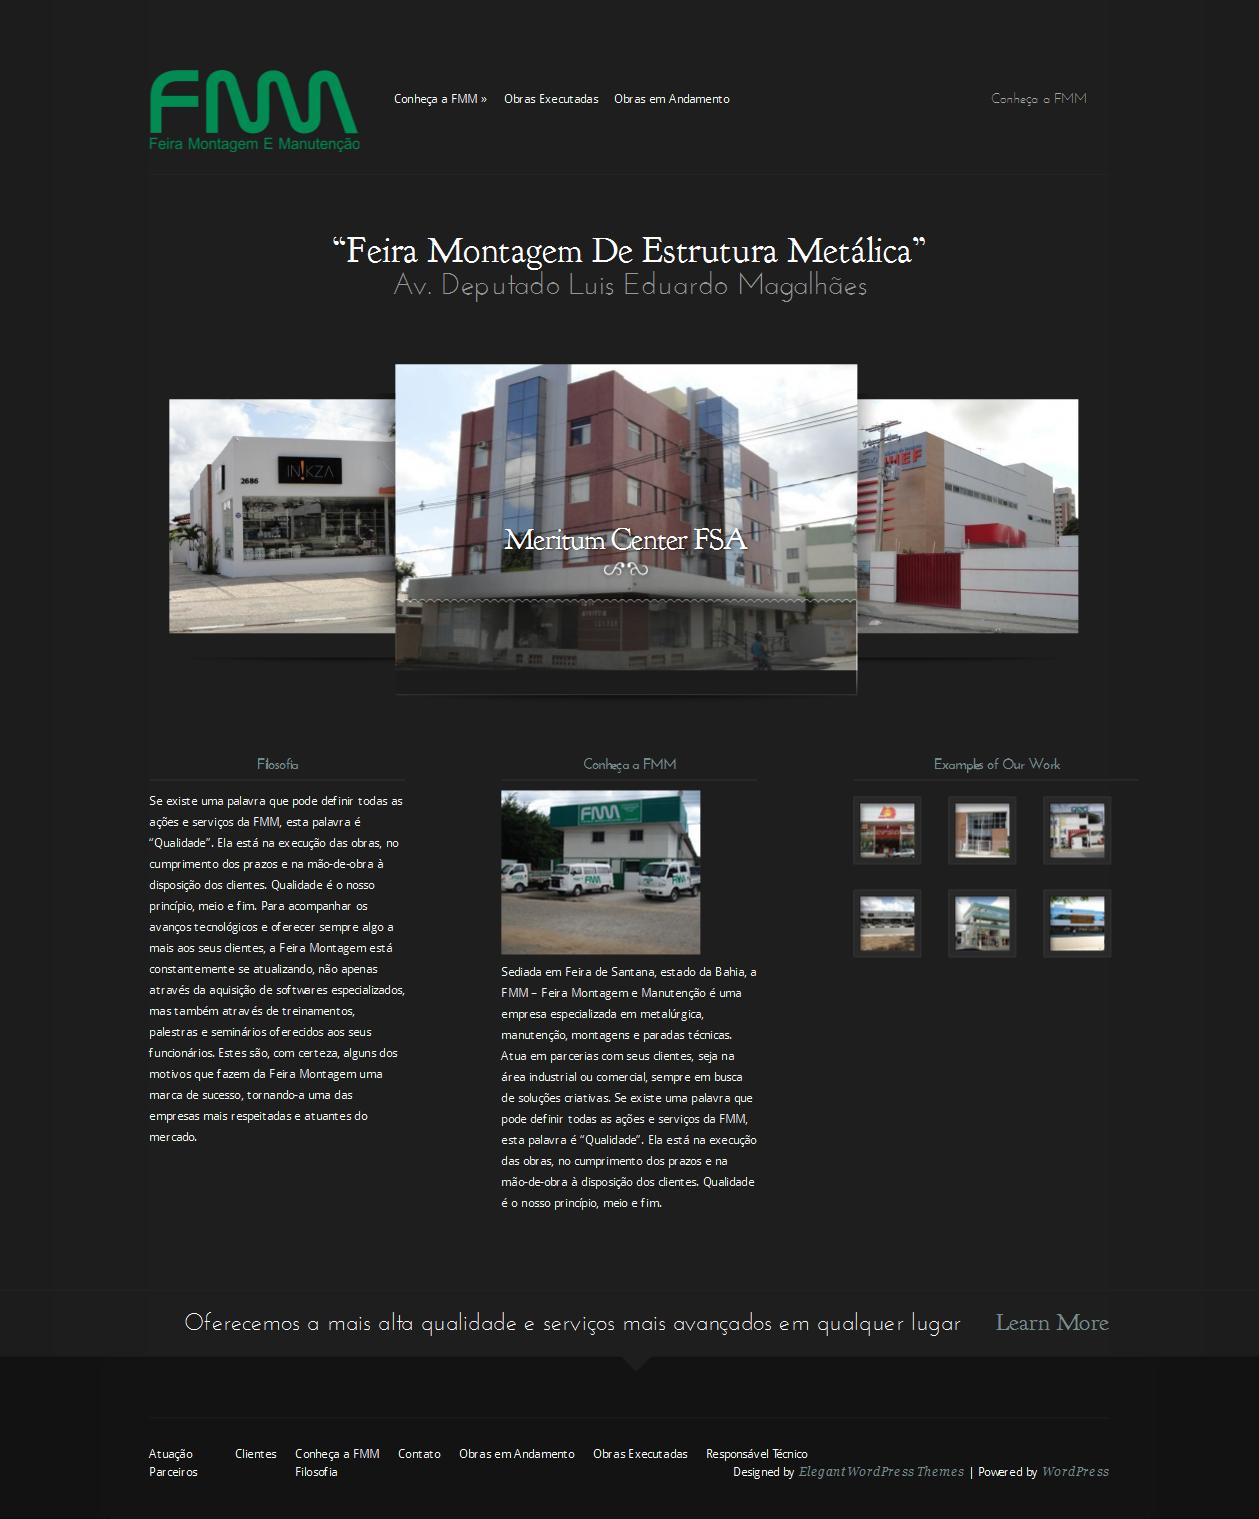 feiramontagem project in wordpress